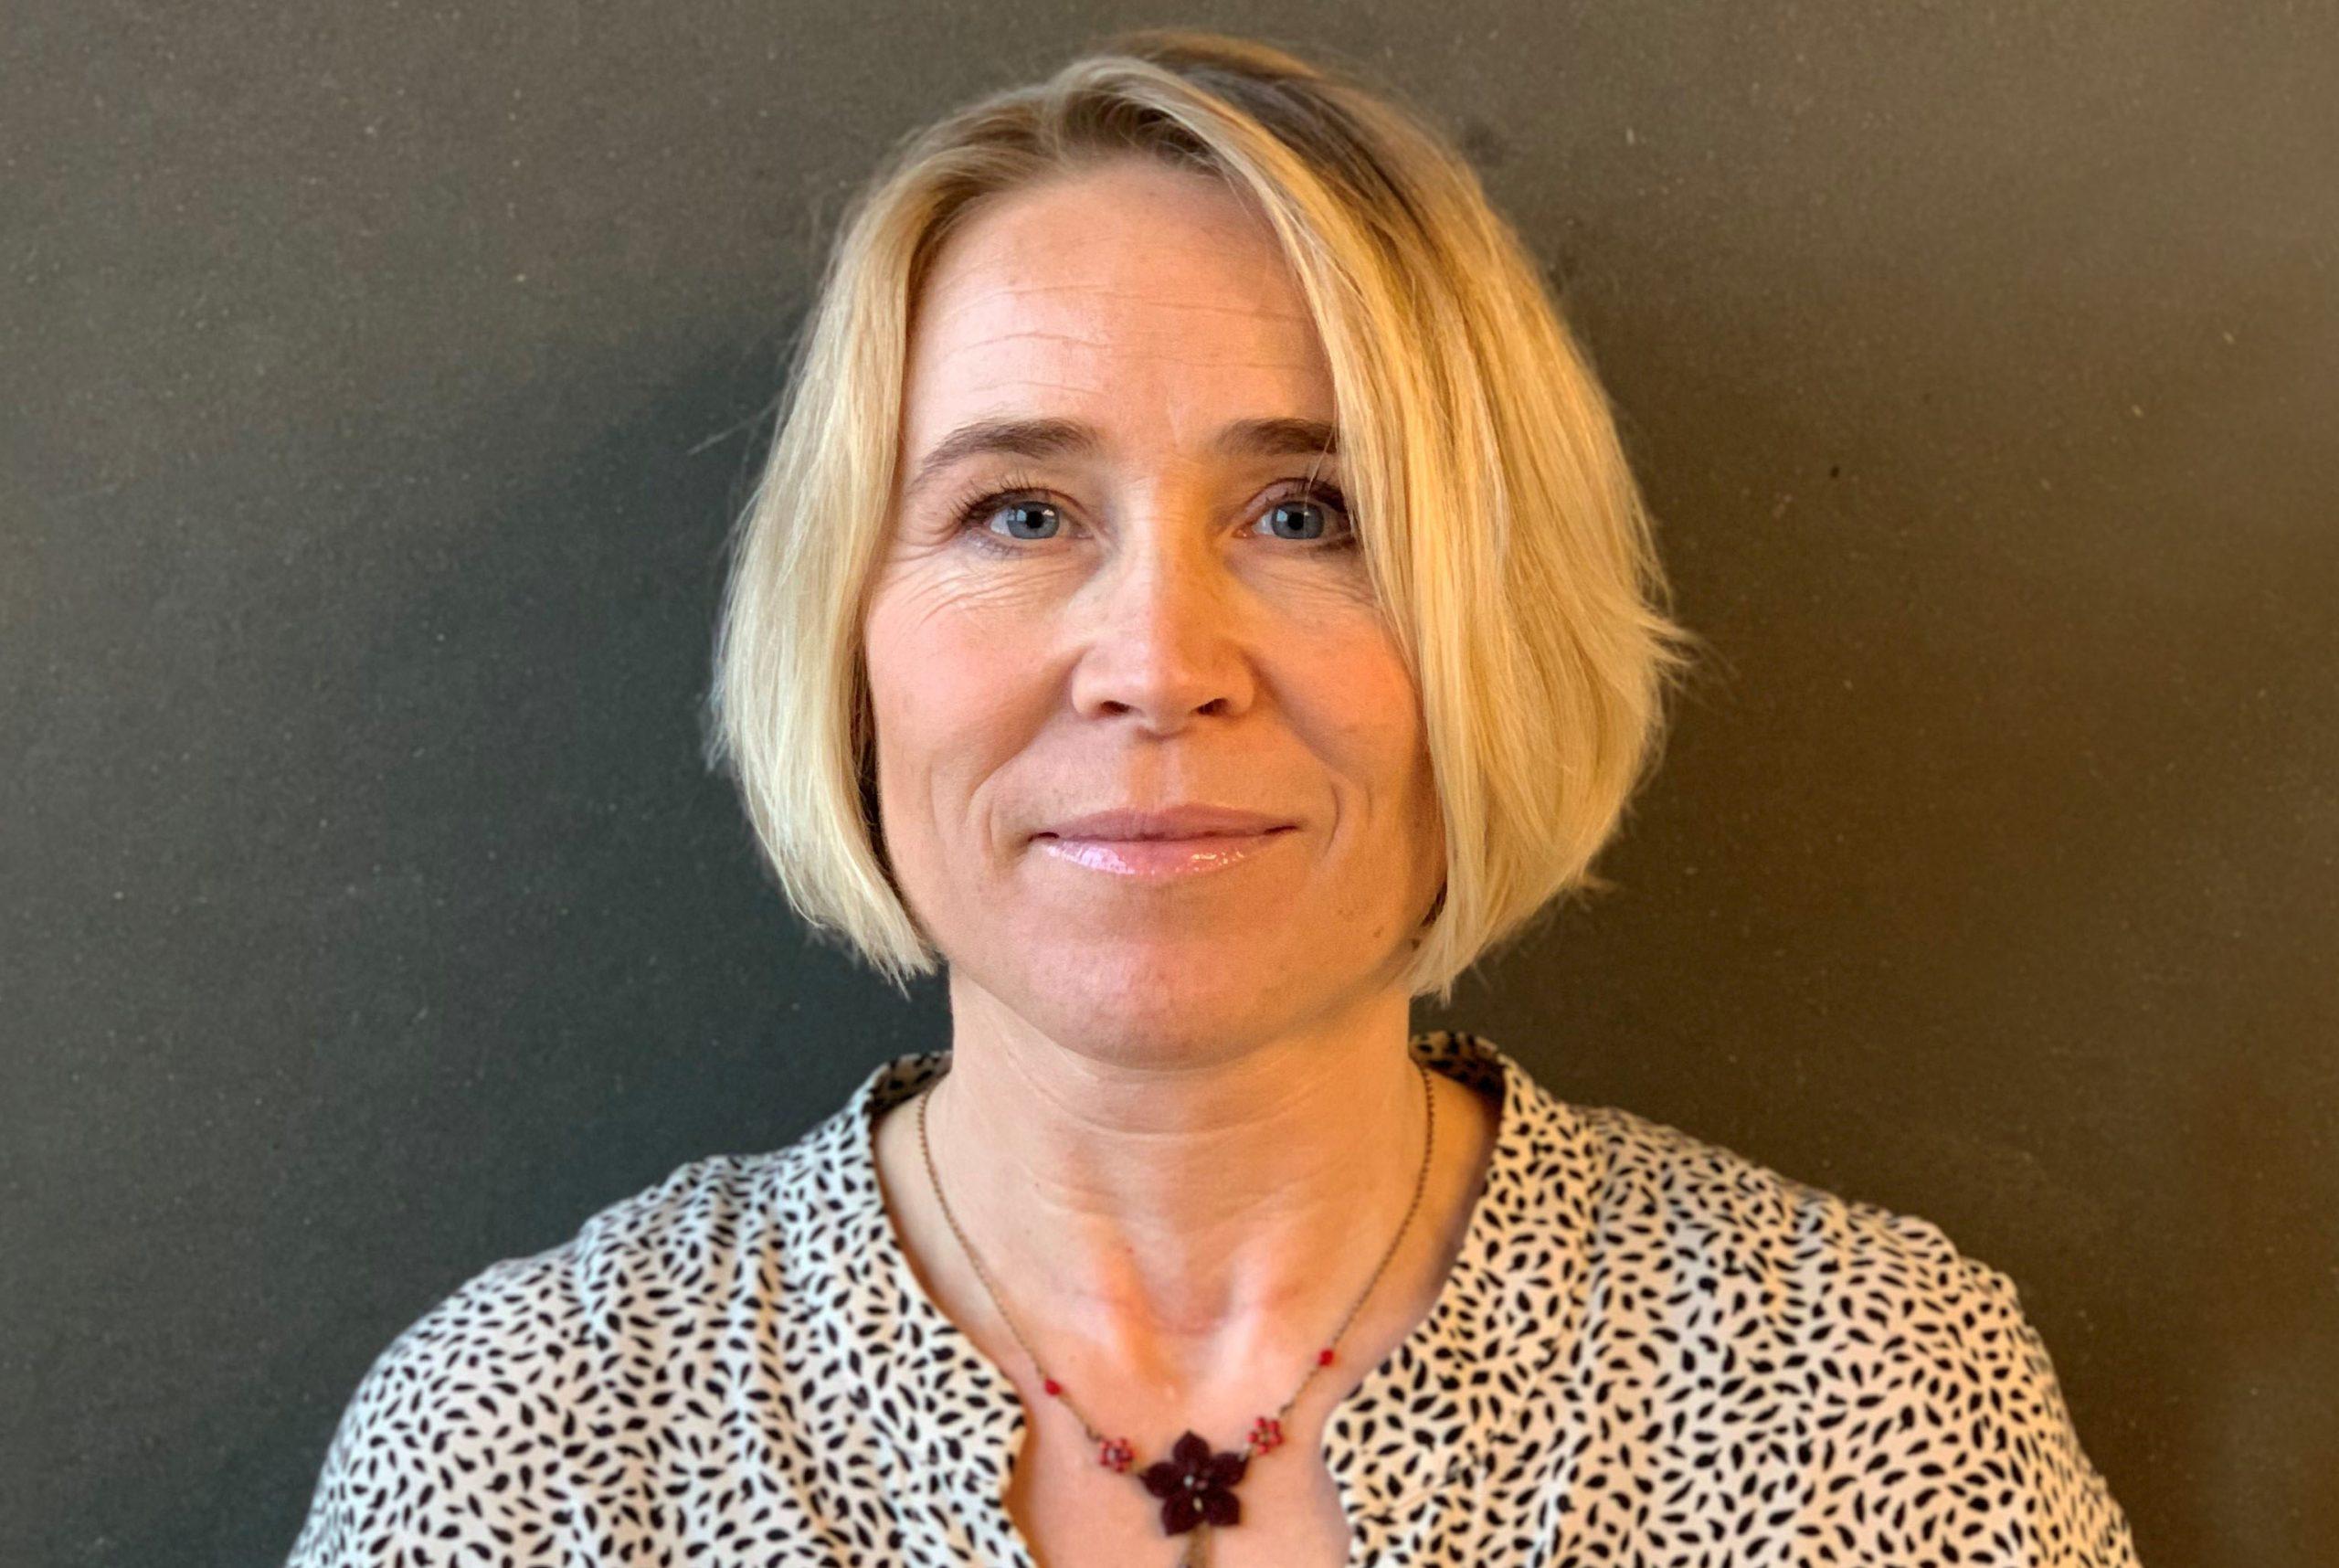 Kontakt SINUZ partner Trine Marie Schunck